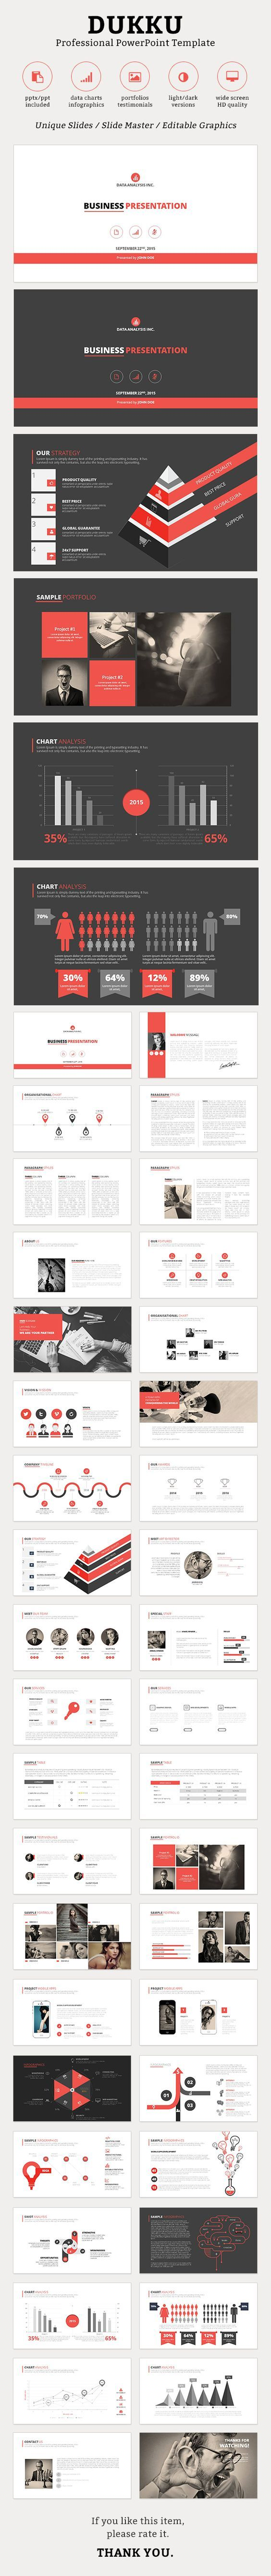 Dukku PowerPoint Template #design #slides Download: http://graphicriver.net/item/dukku-powerpoint-template/13057919?ref=ksioks: